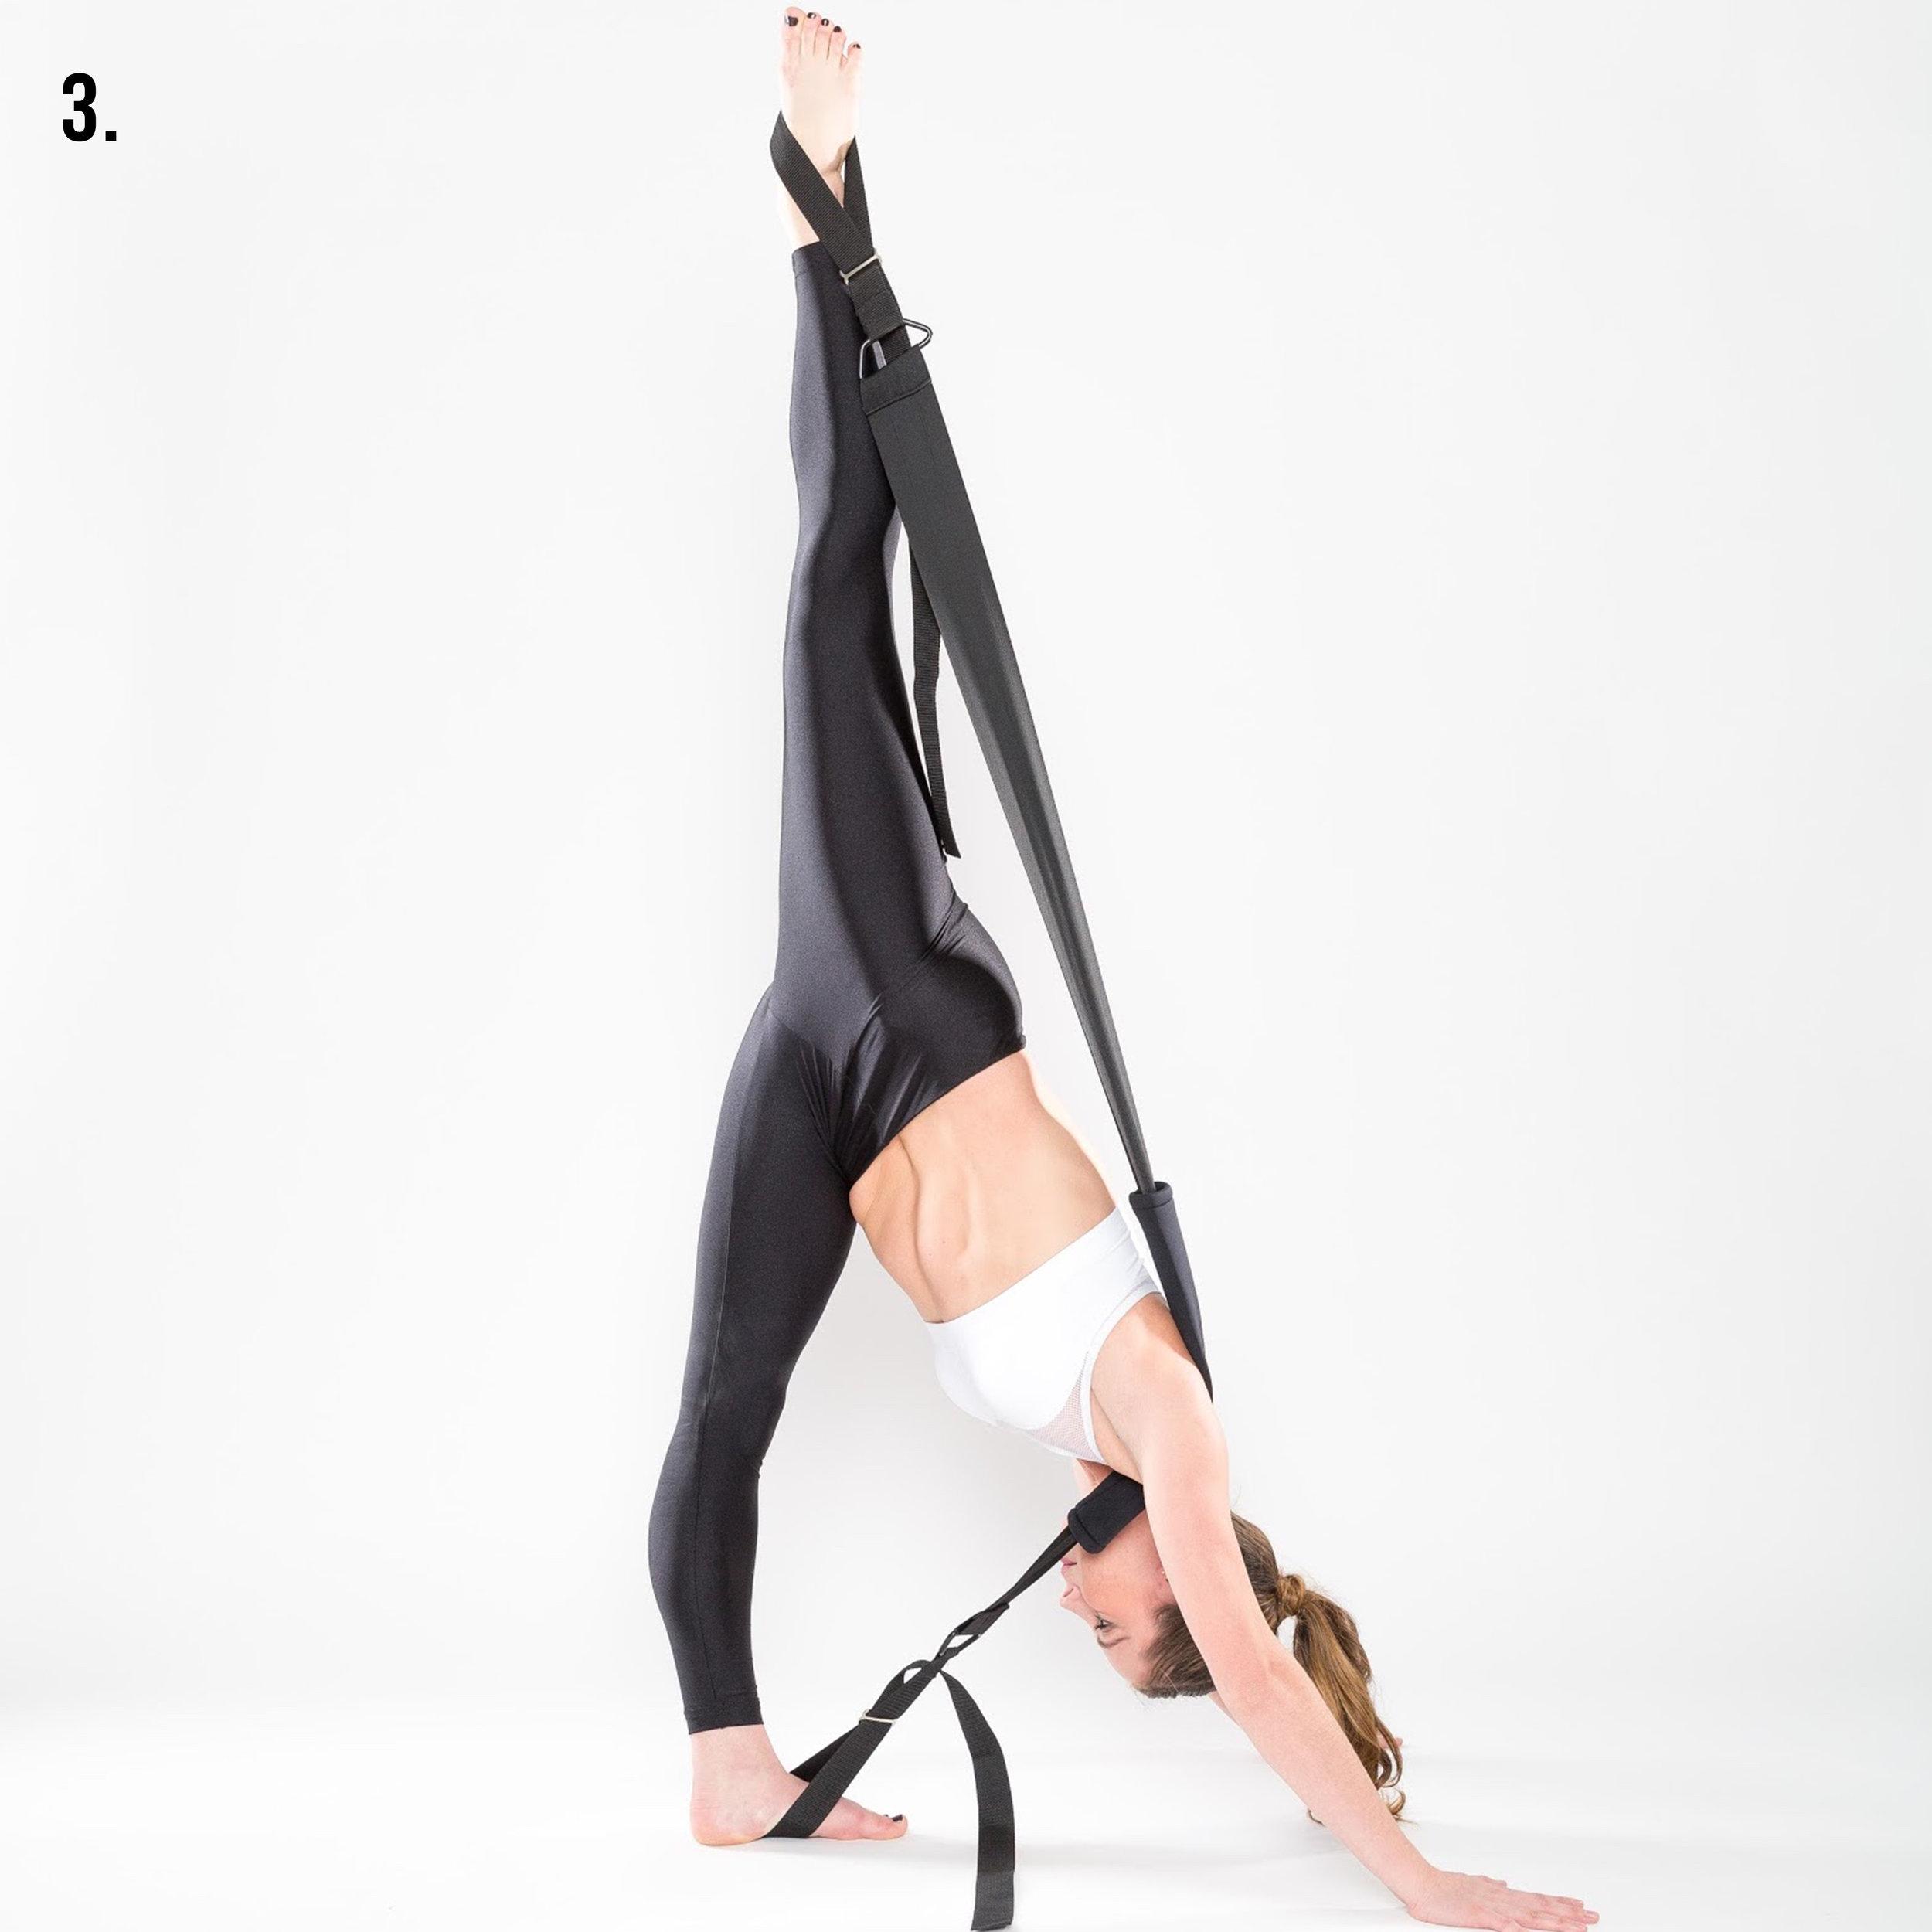 blog-FLX_Yoga_Holtz-065.jpg